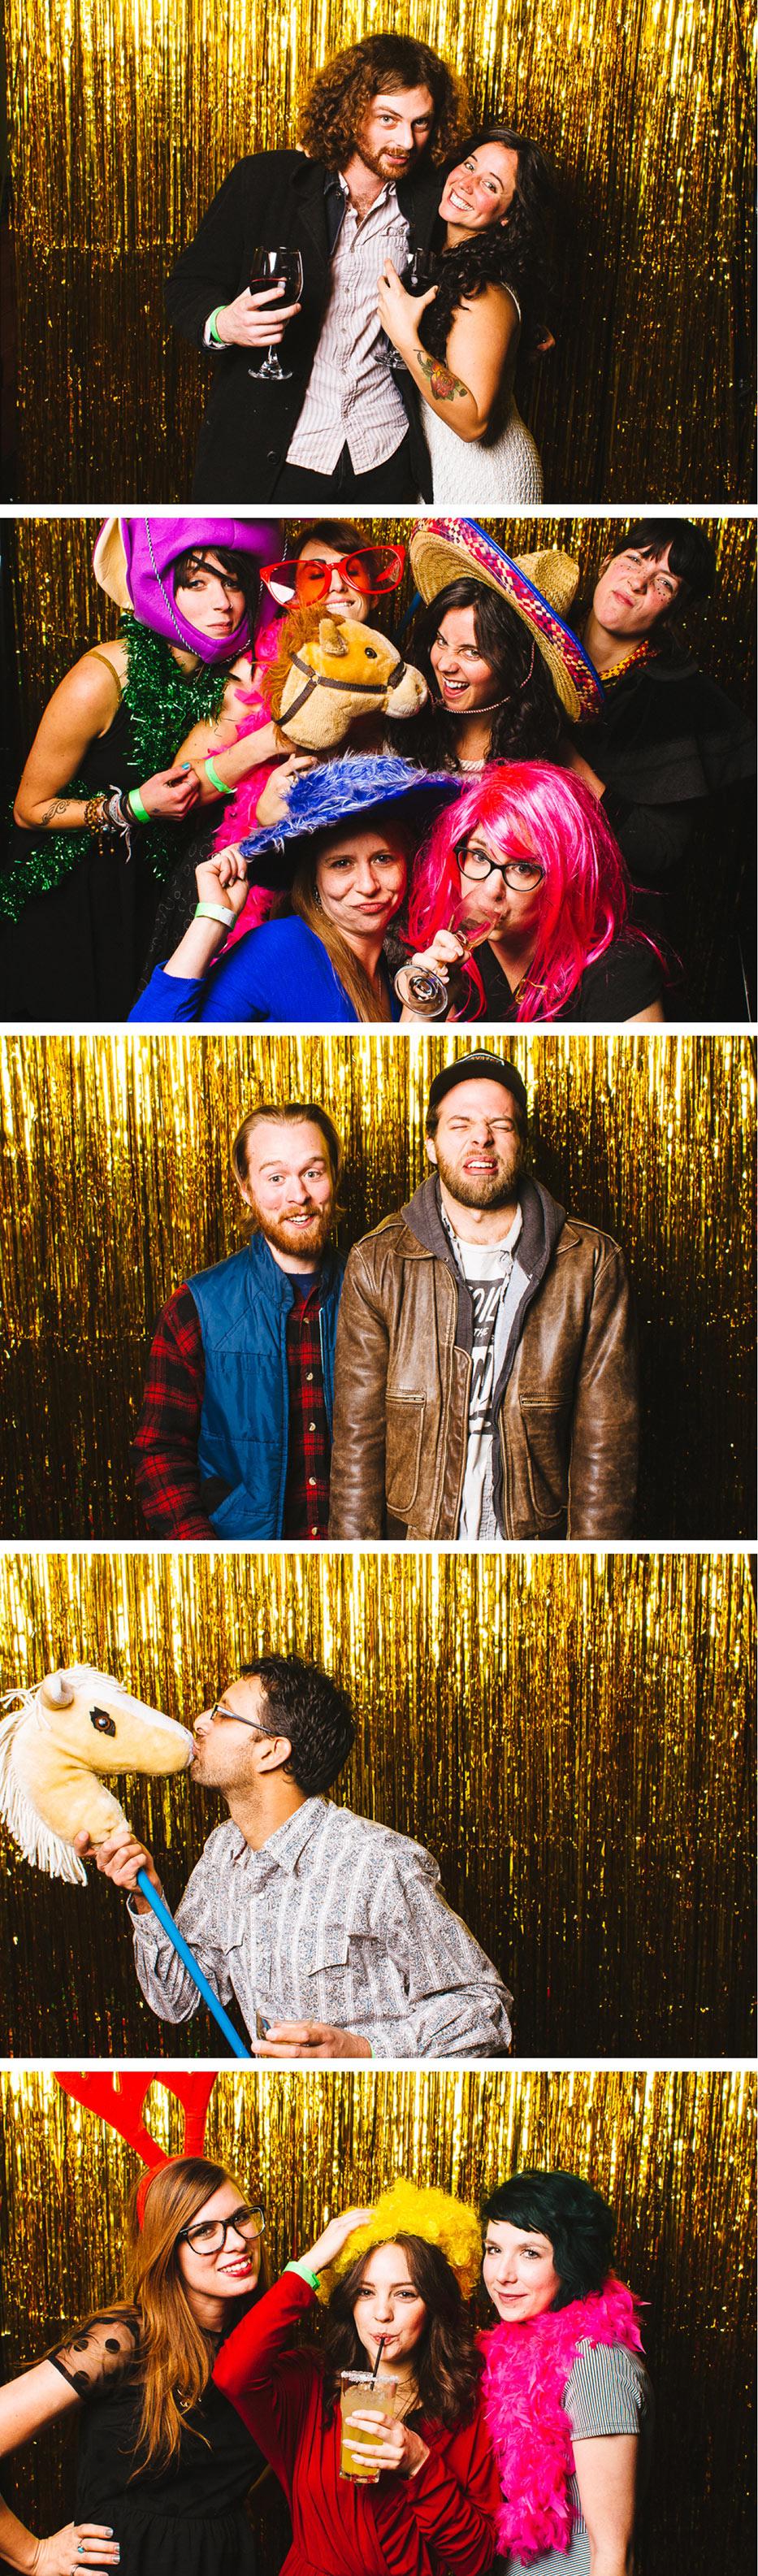 CK-Photo-Nashville-Photobooth-B4.jpg